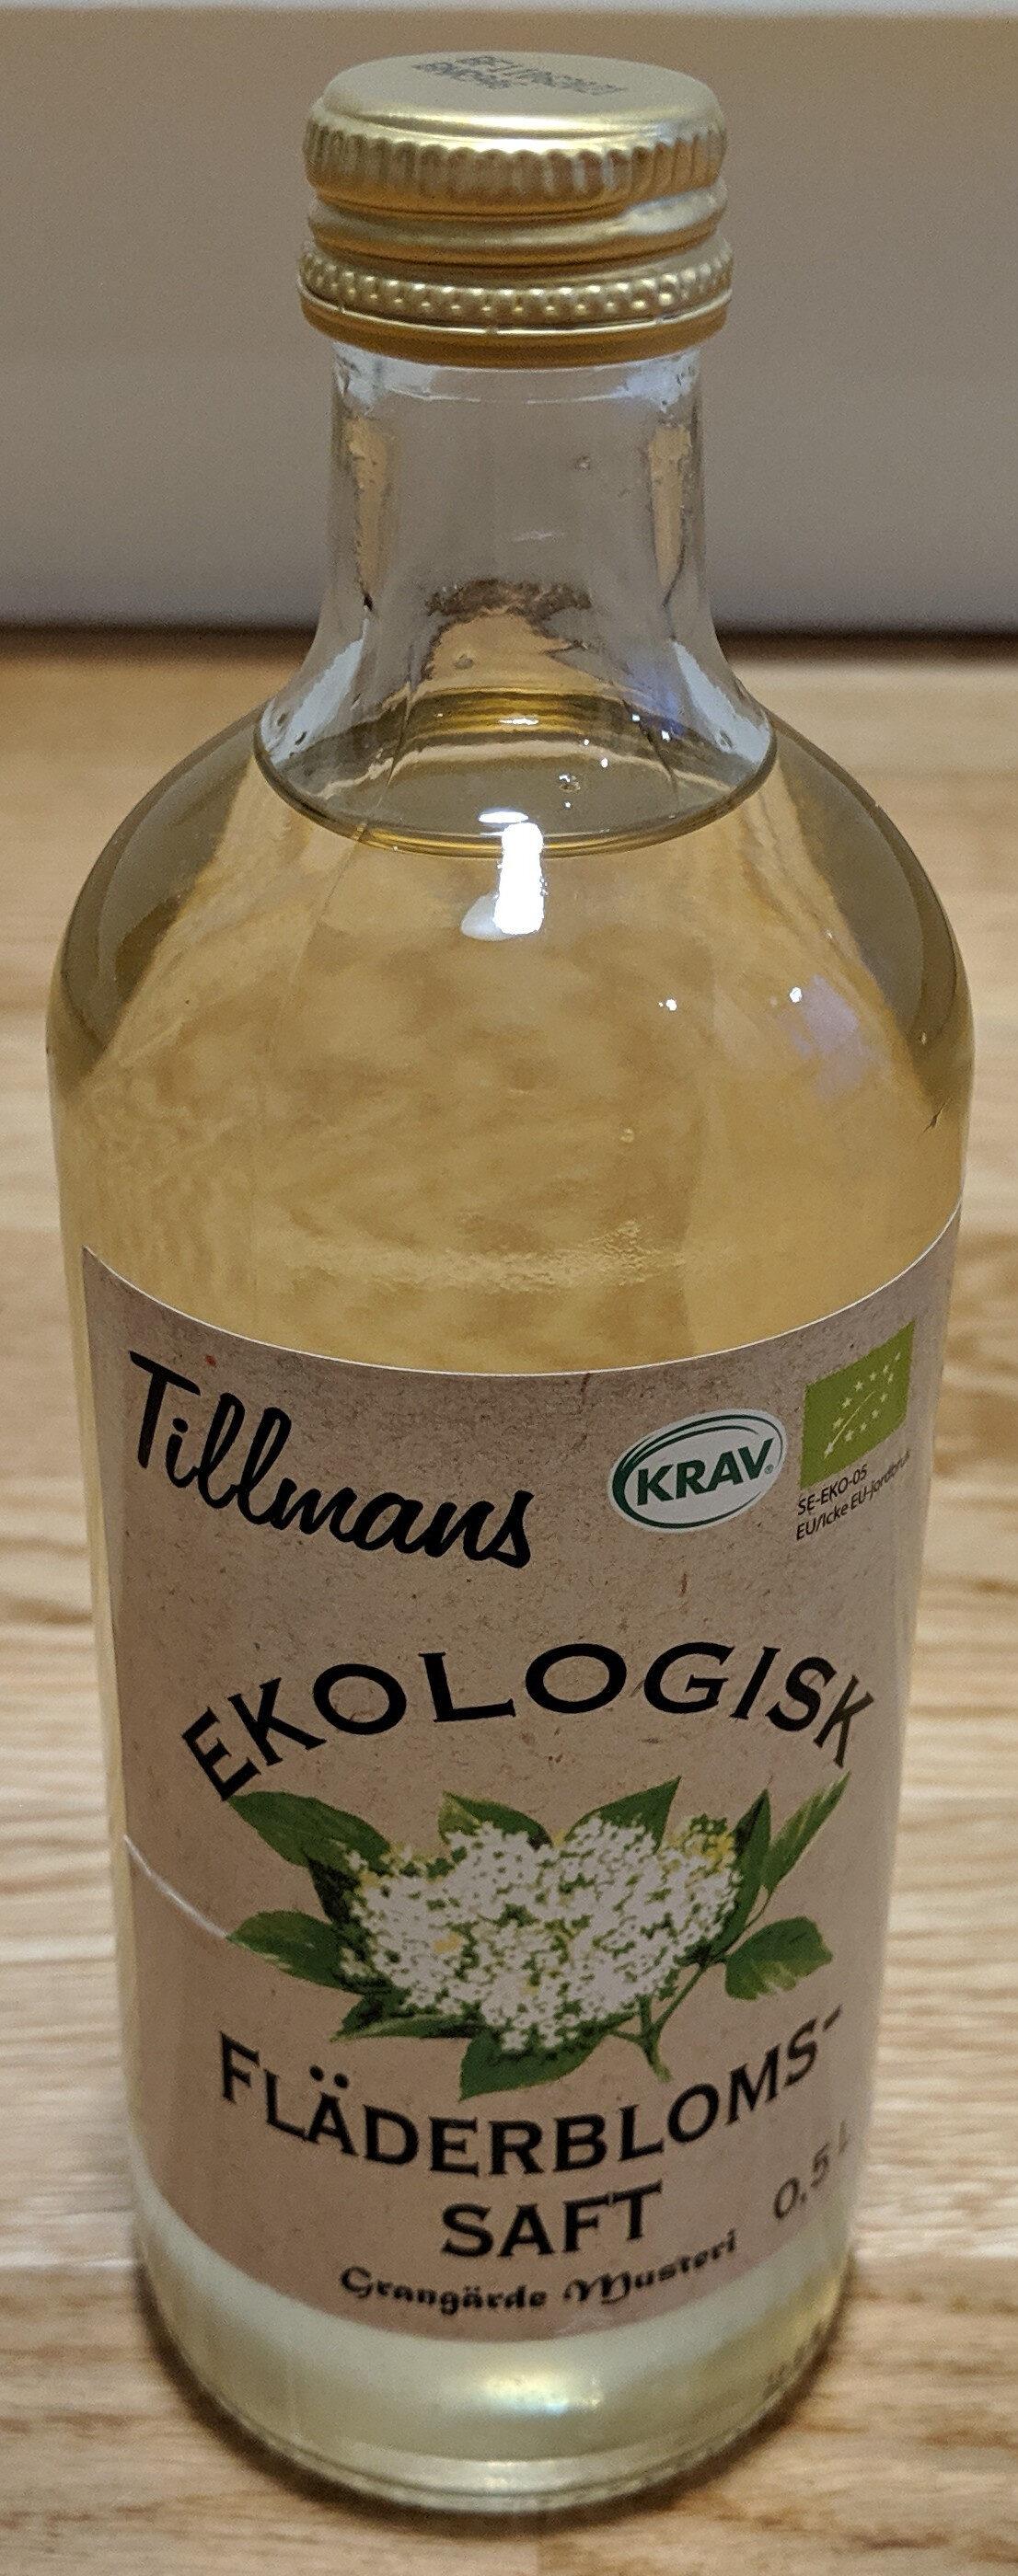 Tillmans Ekologisk Fläderbloms-saft - Produkt